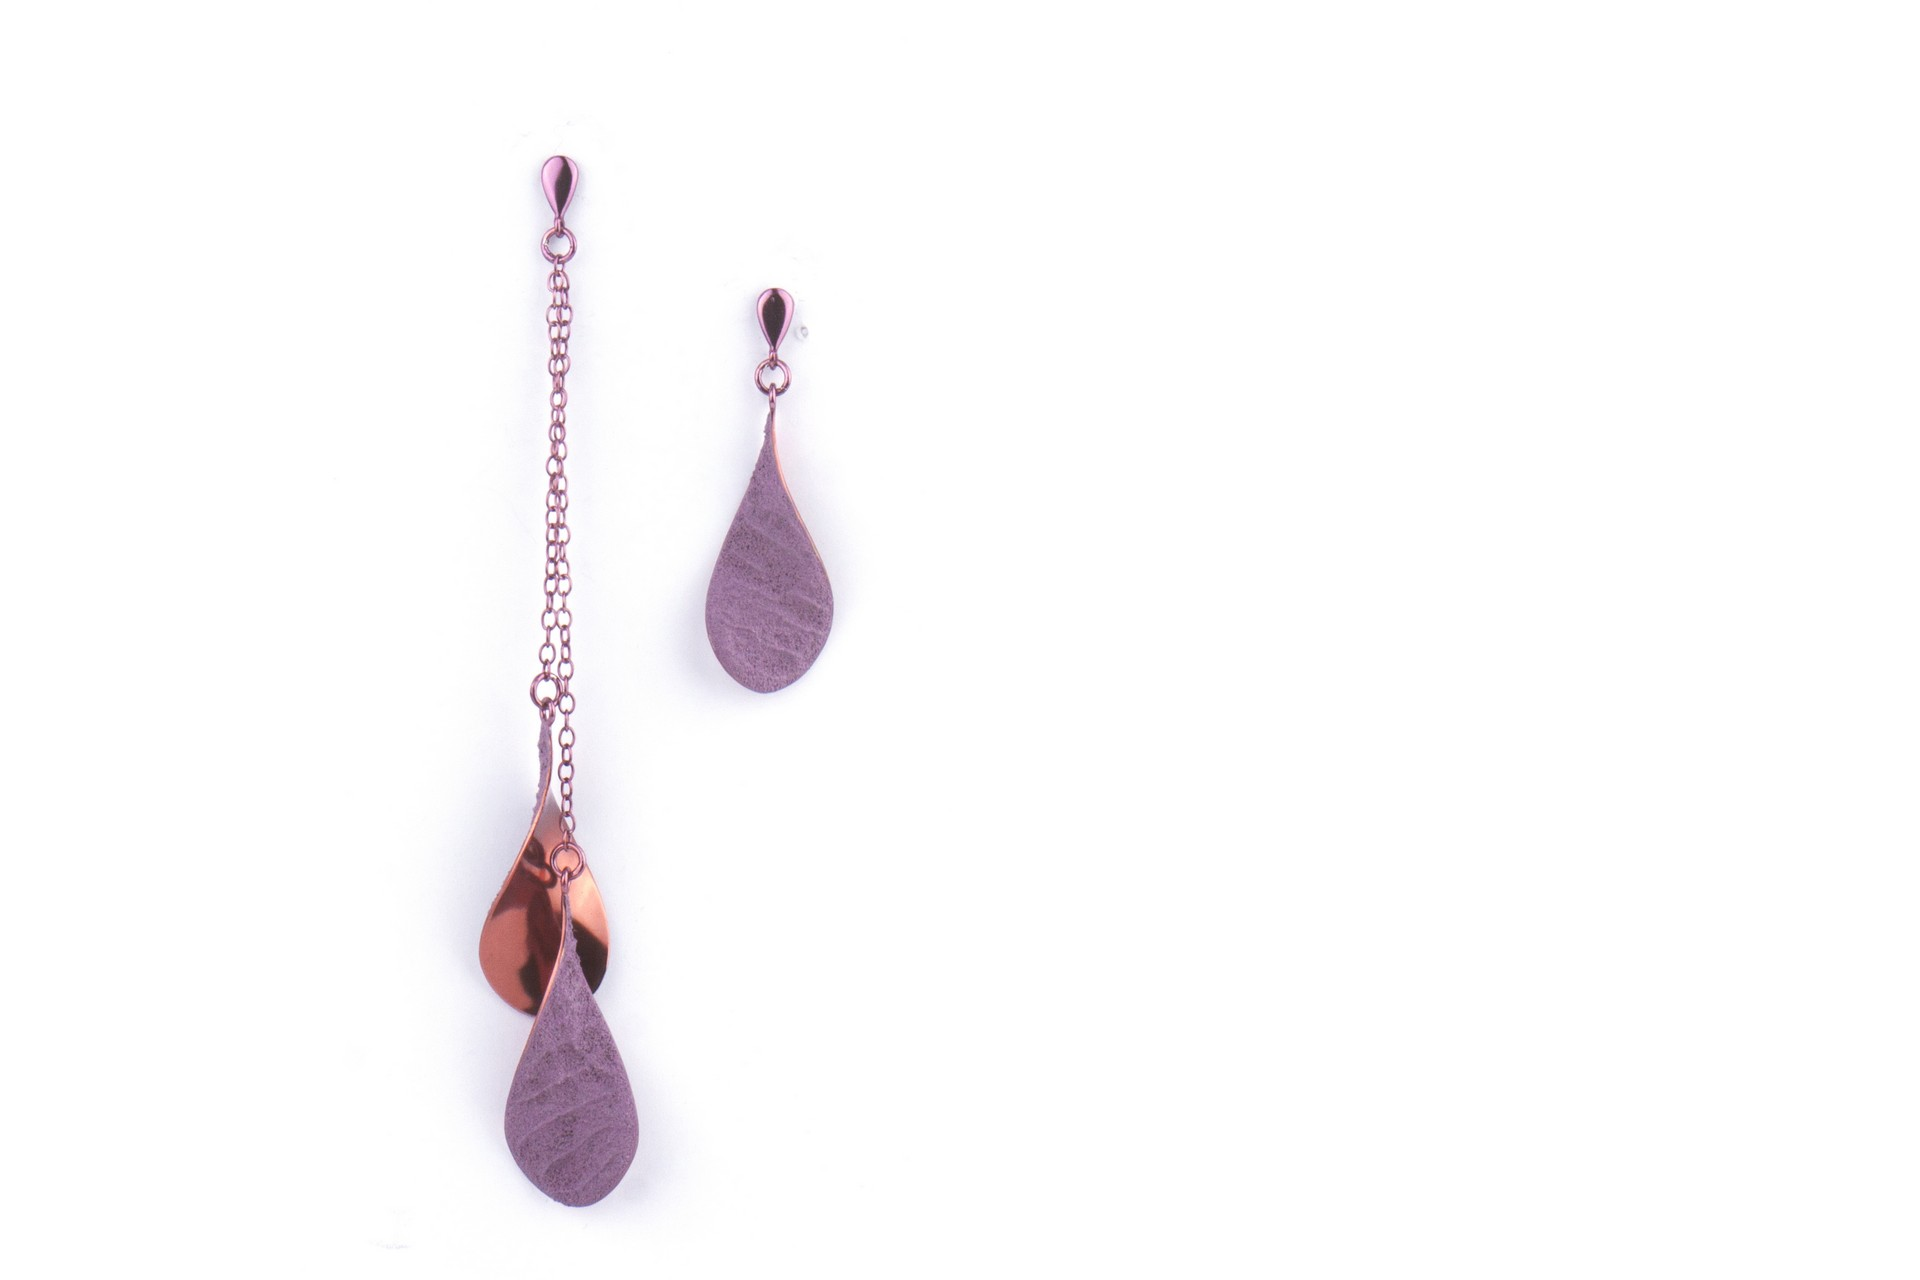 Kadi_Veesaar_Jewellery_Tinkle_Chain_earrings_maroon